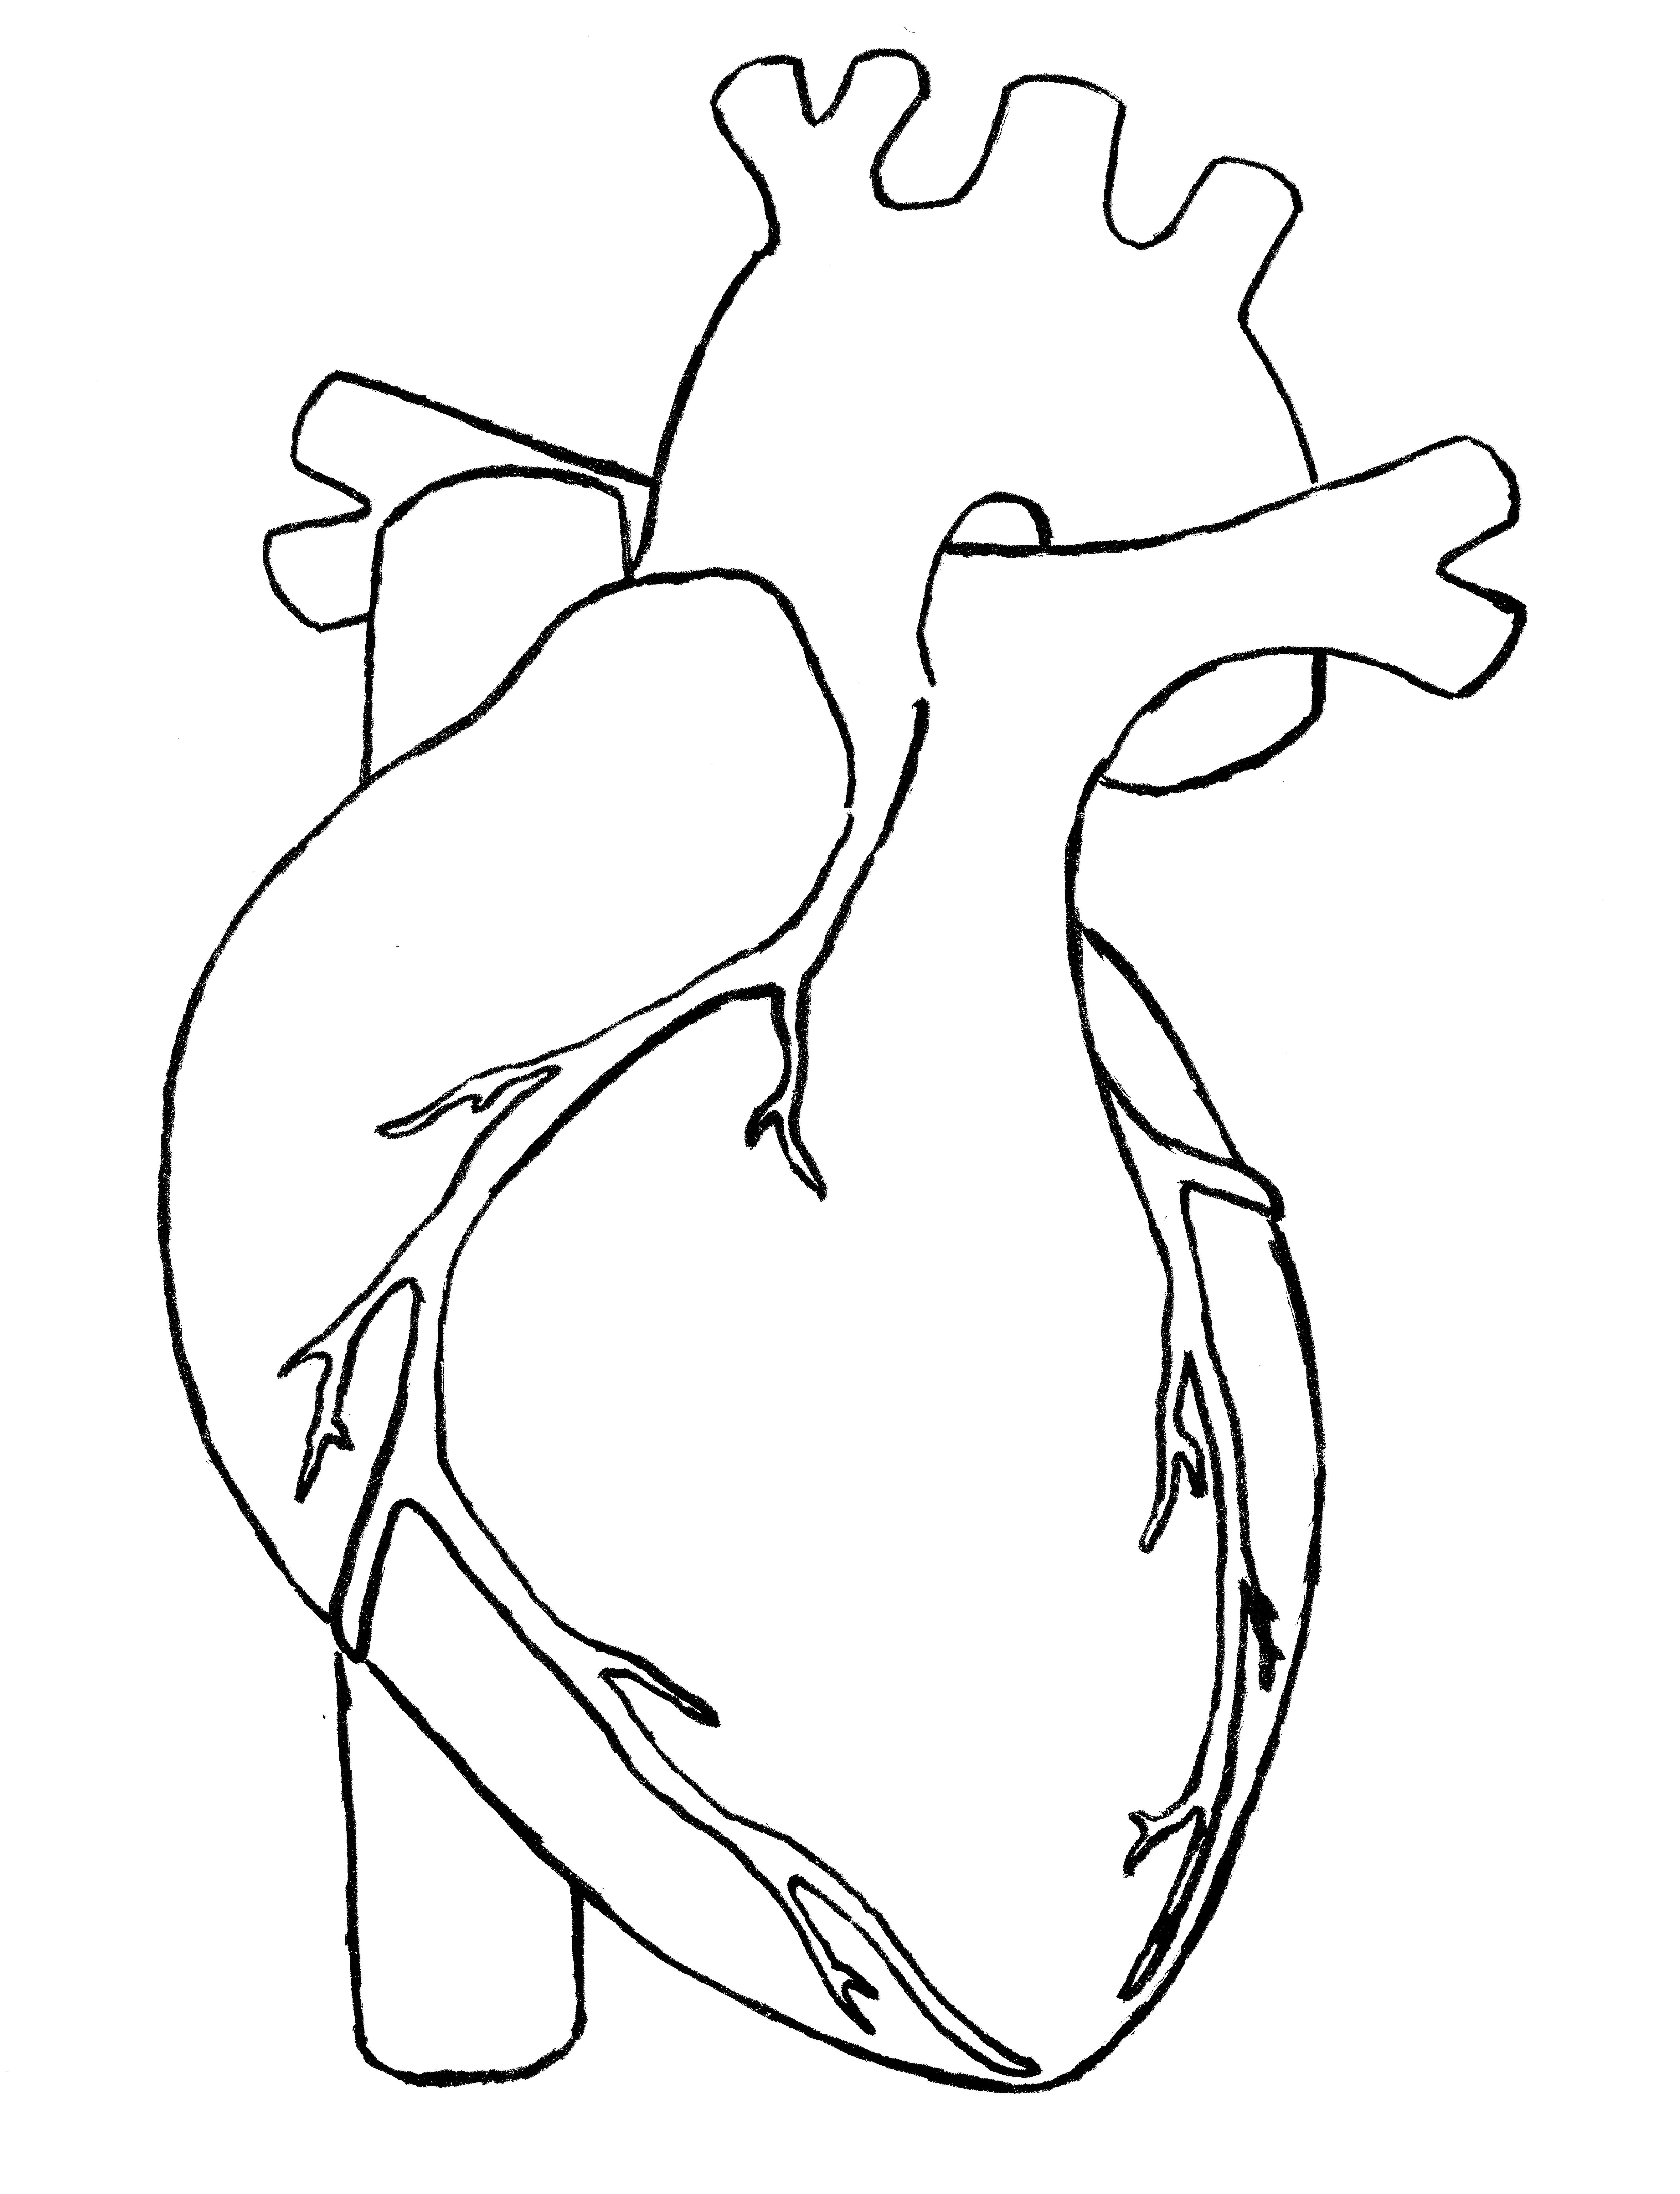 6191x8085 Simple Human Heart Drawing Human Heart Drawing Drawing Images